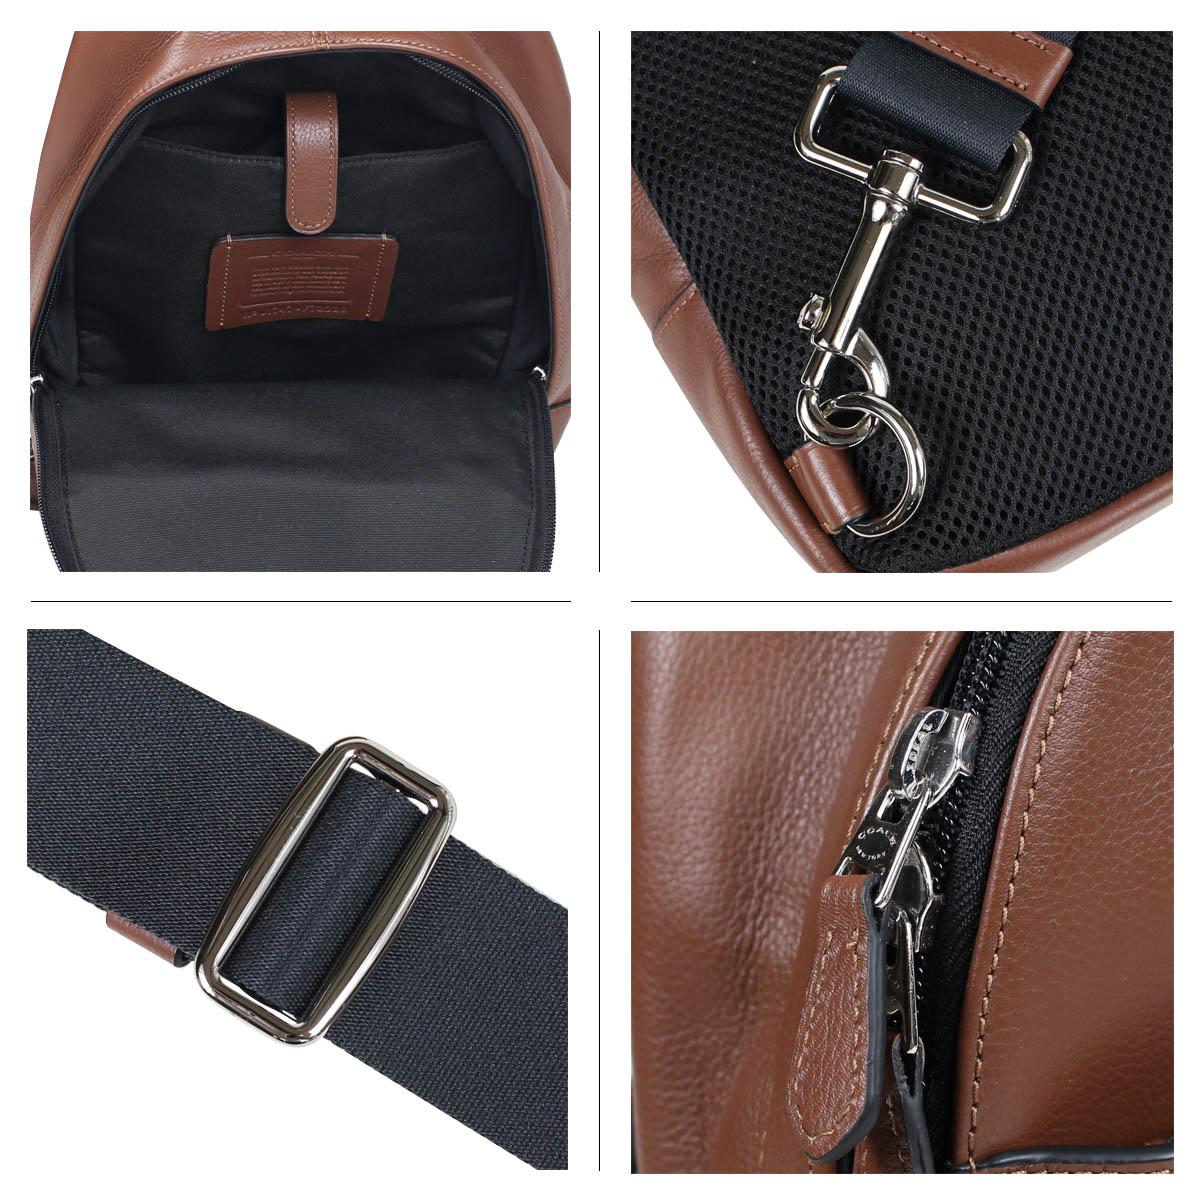 e01b6724efb35 ... COACH F72226 coach bag shoulder bag body bag men leather brown [5/11  Shinnyu